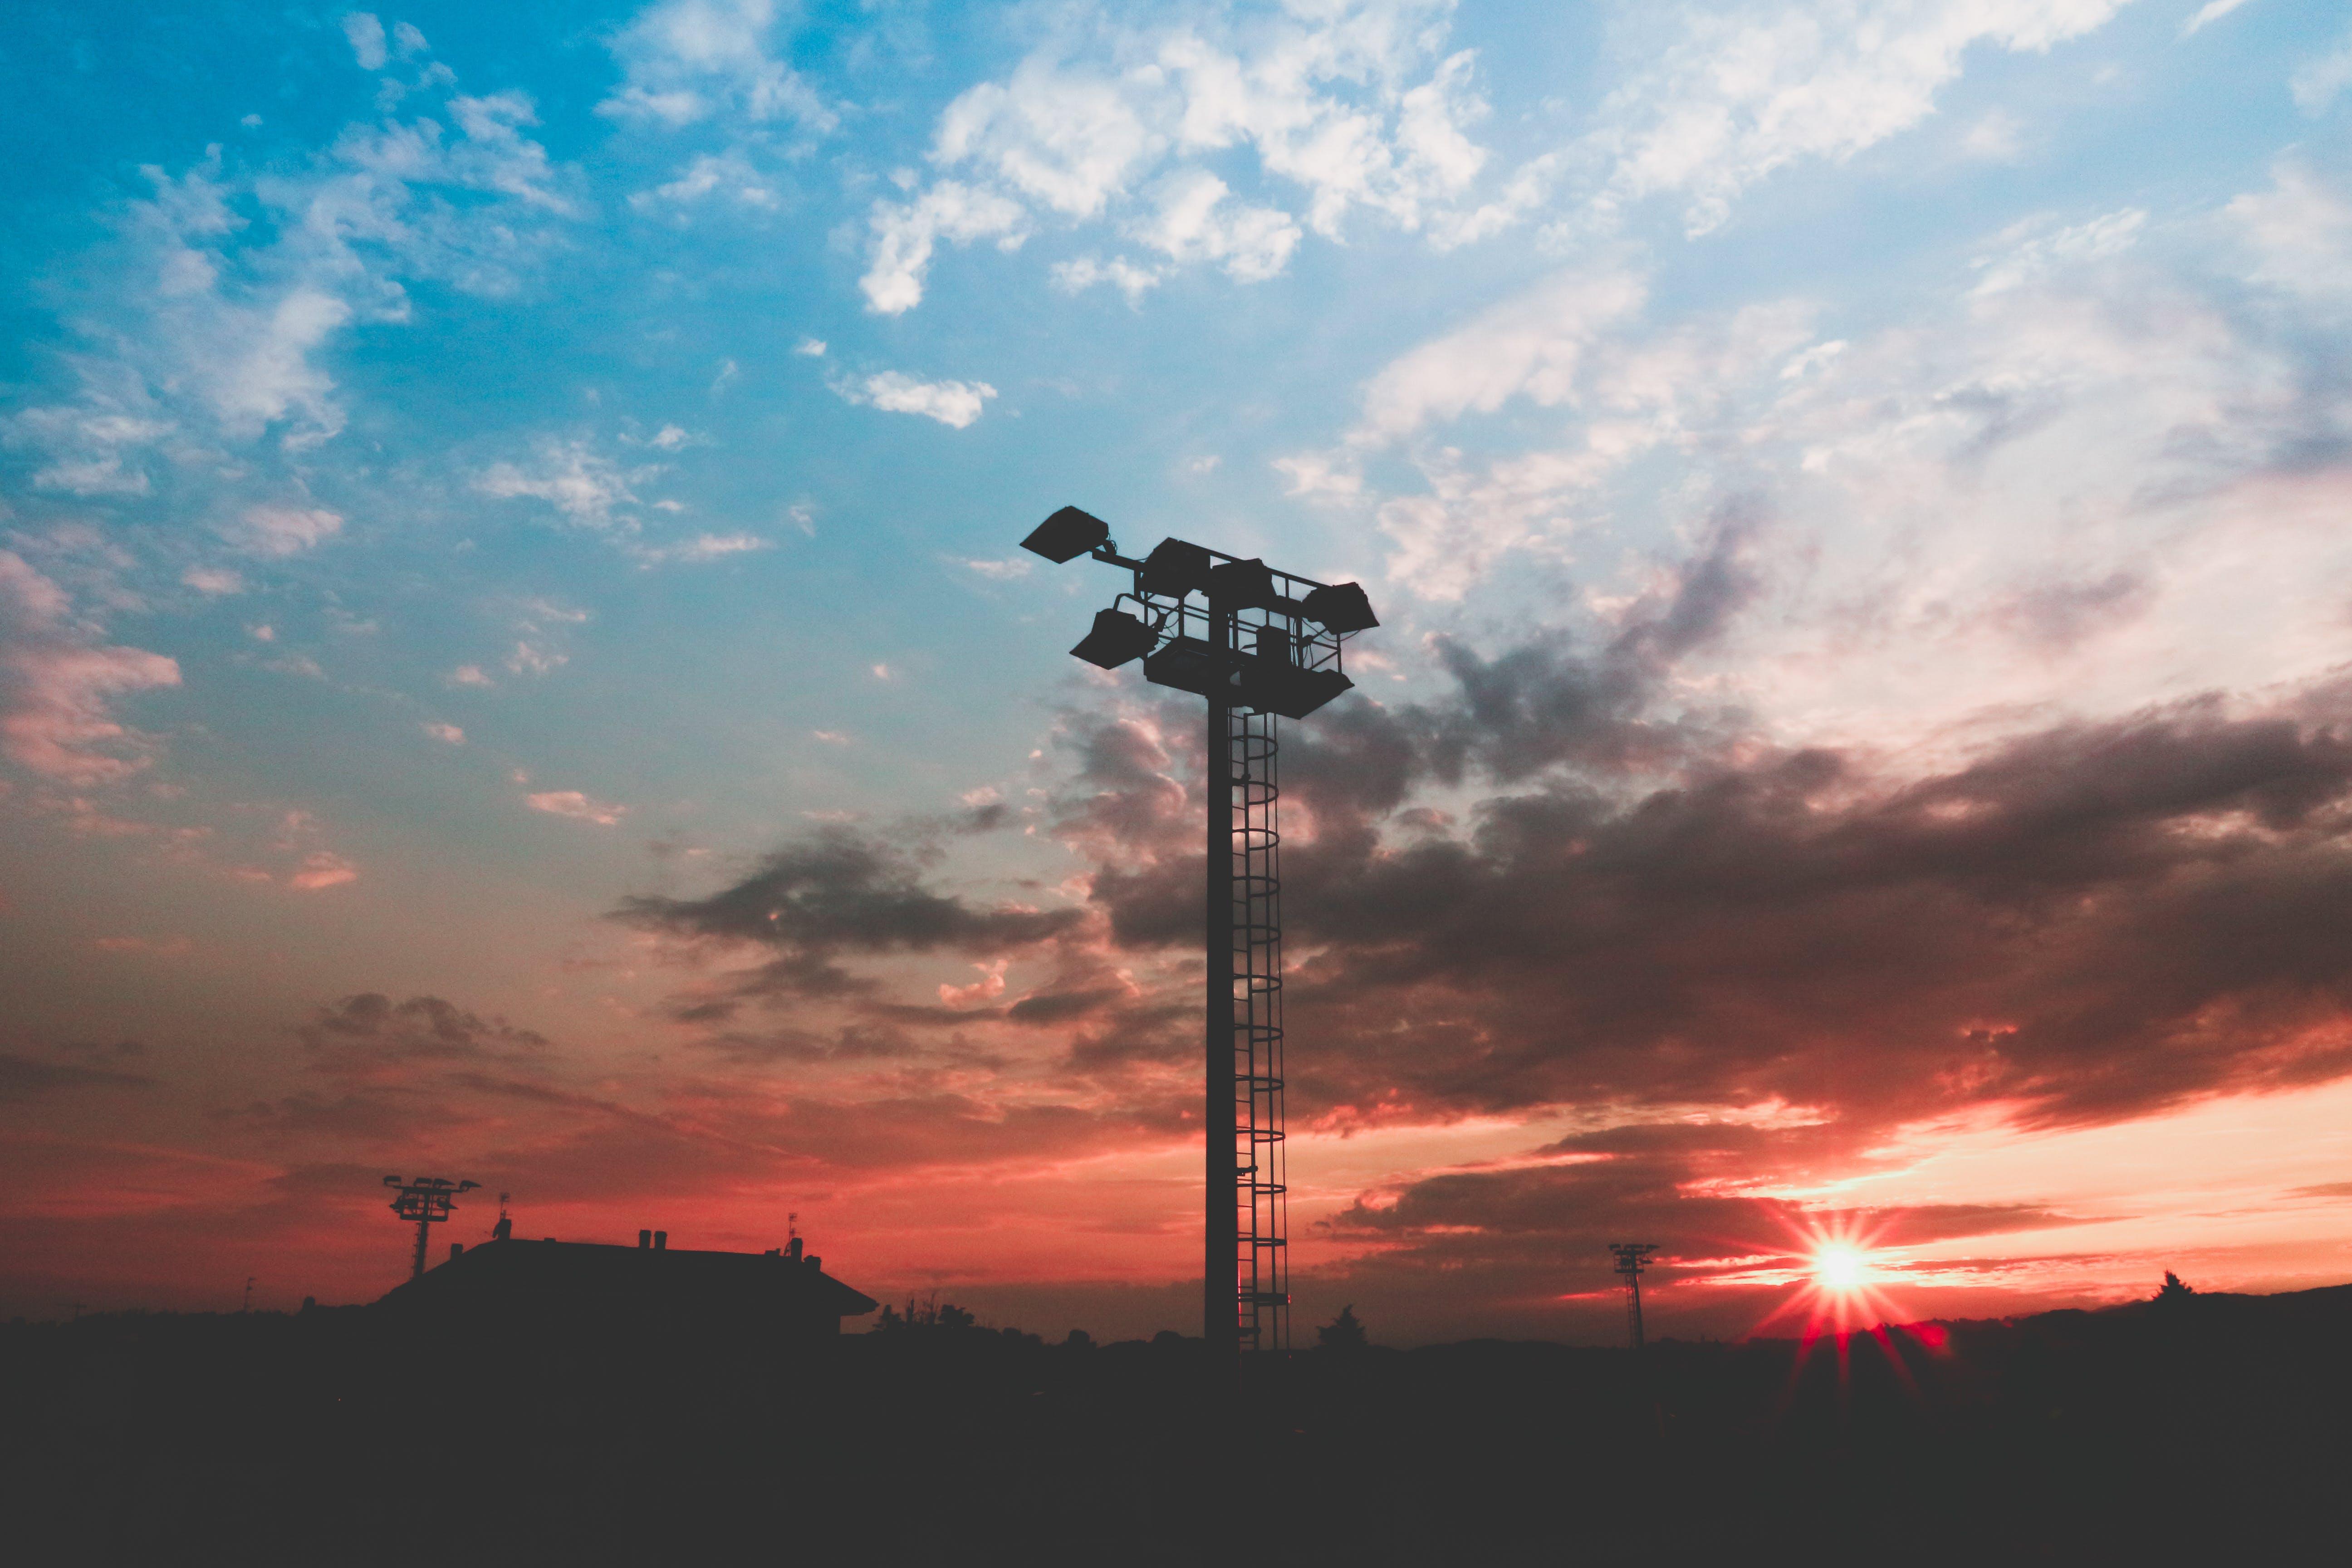 Black Light Tower during Sunset